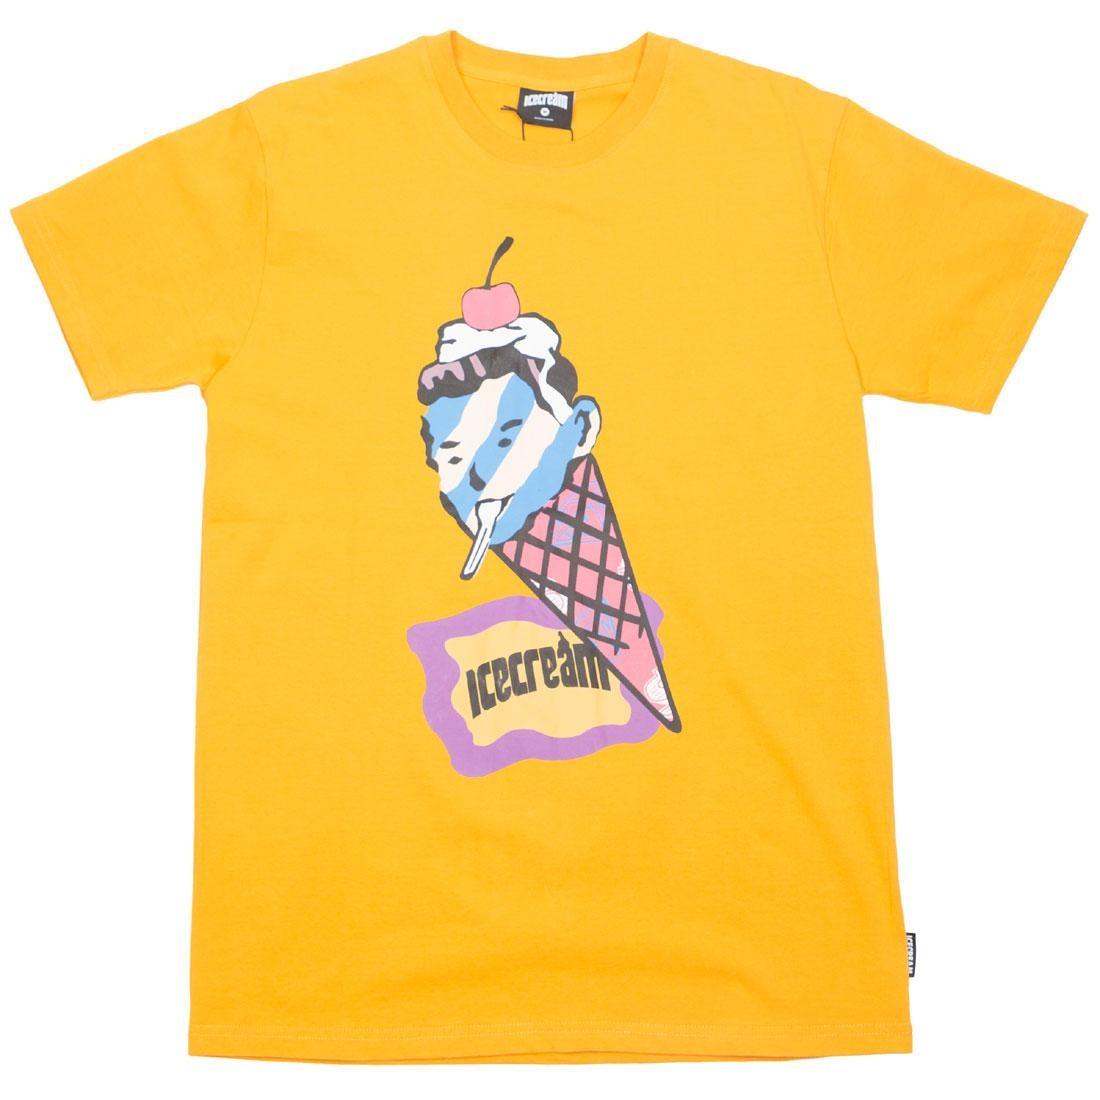 Ice Cream Men Conehead Tee (yellow / cadmium)